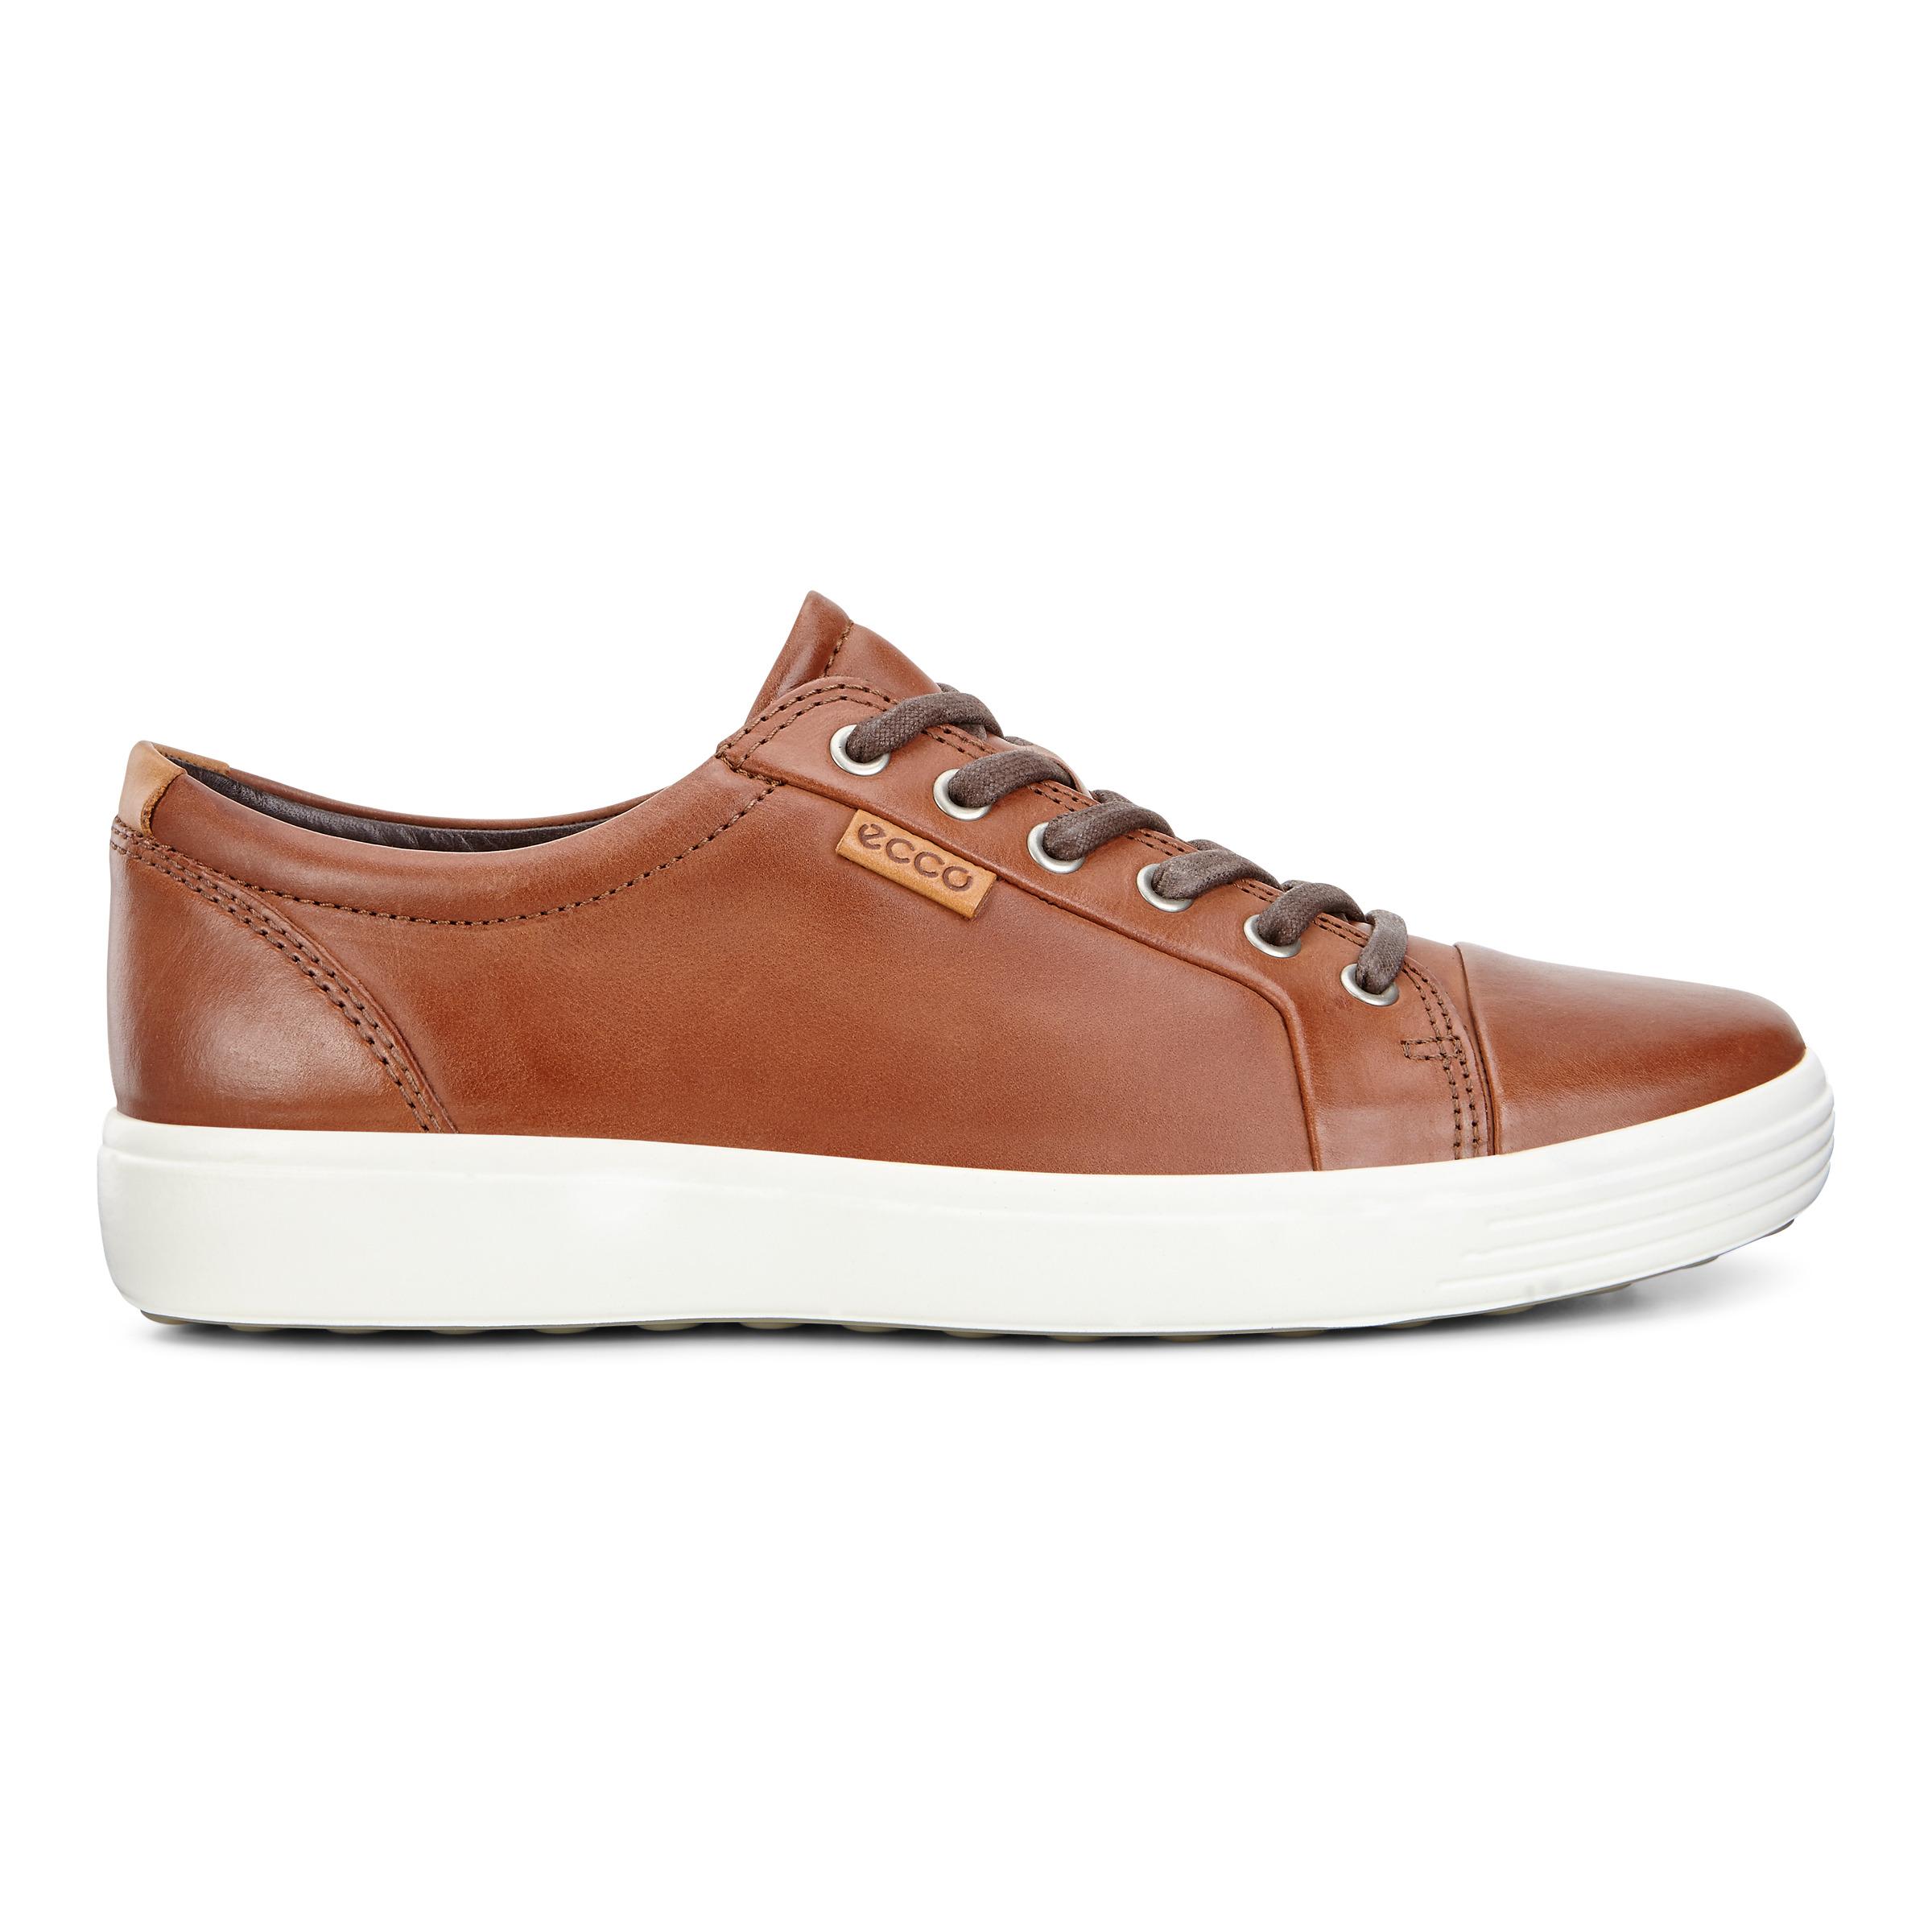 ECCO Soft 7 M Sneakers Size 12-12.5 Mahogany